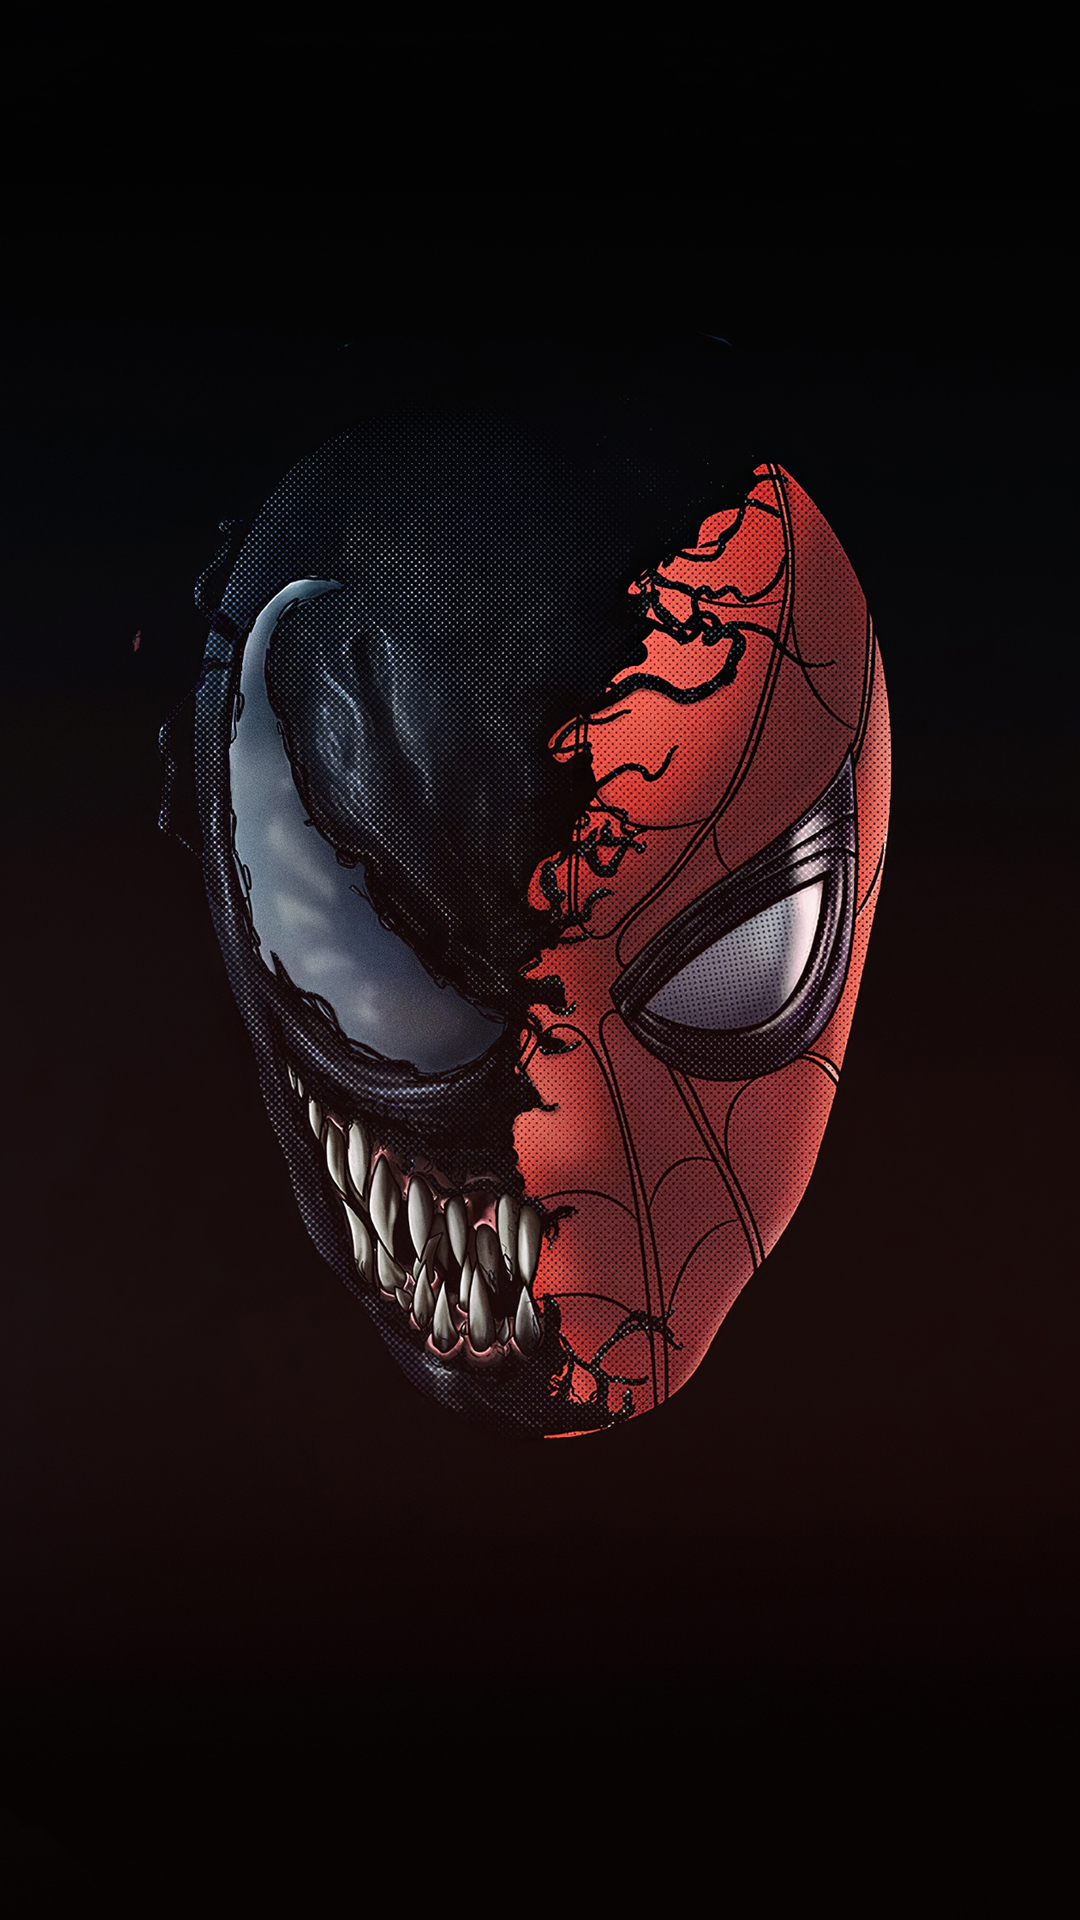 Spiderman x venom